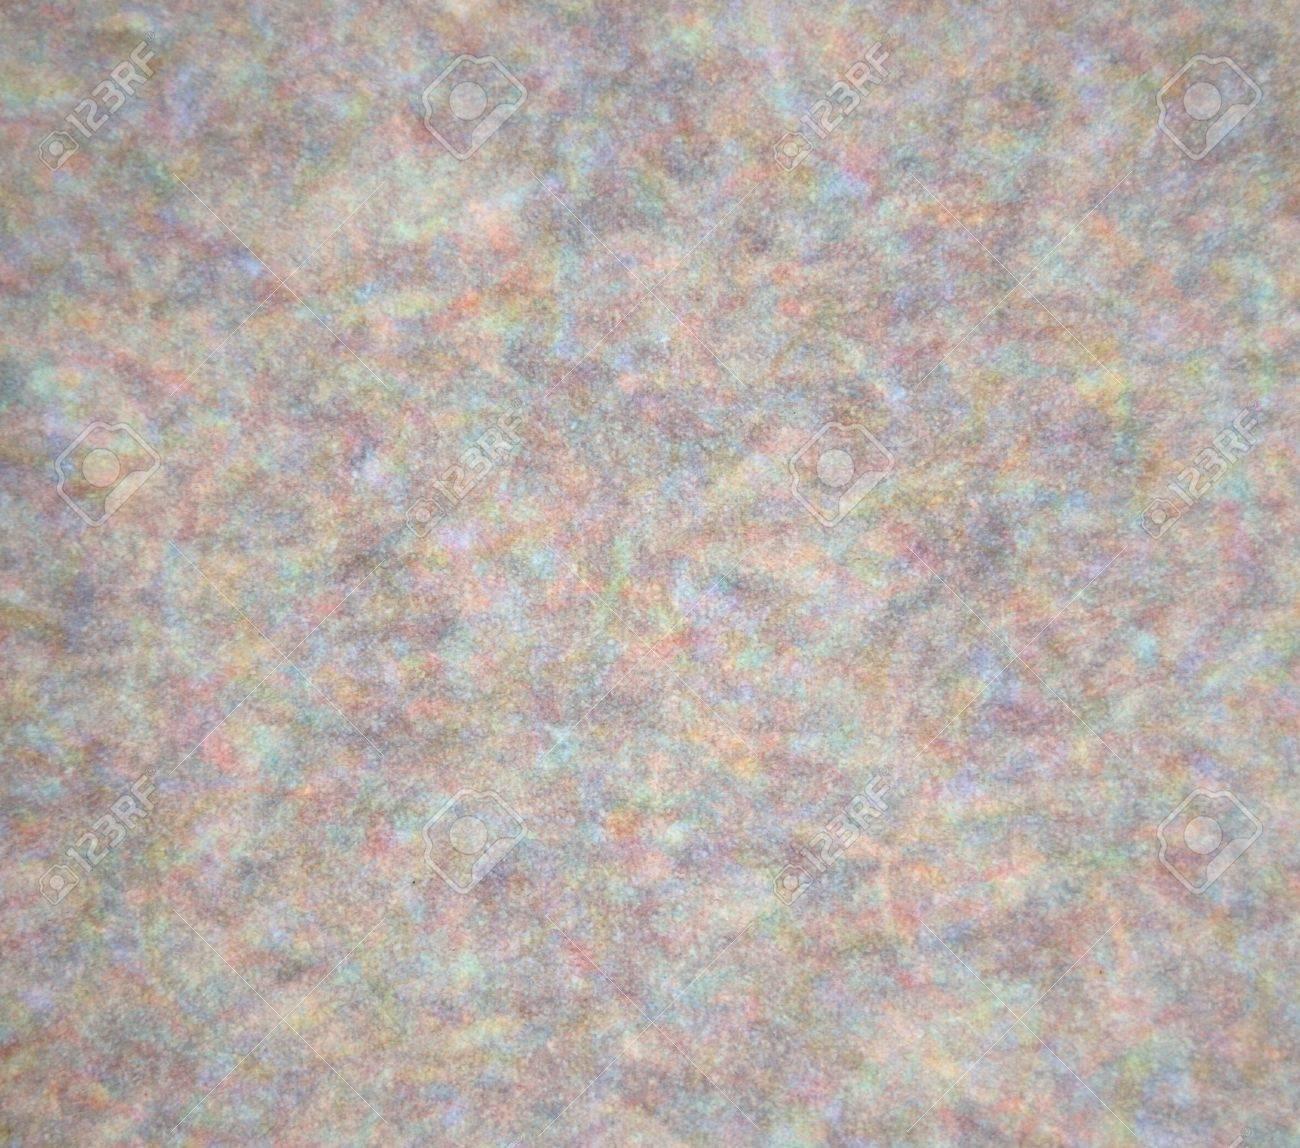 closeup texture of a